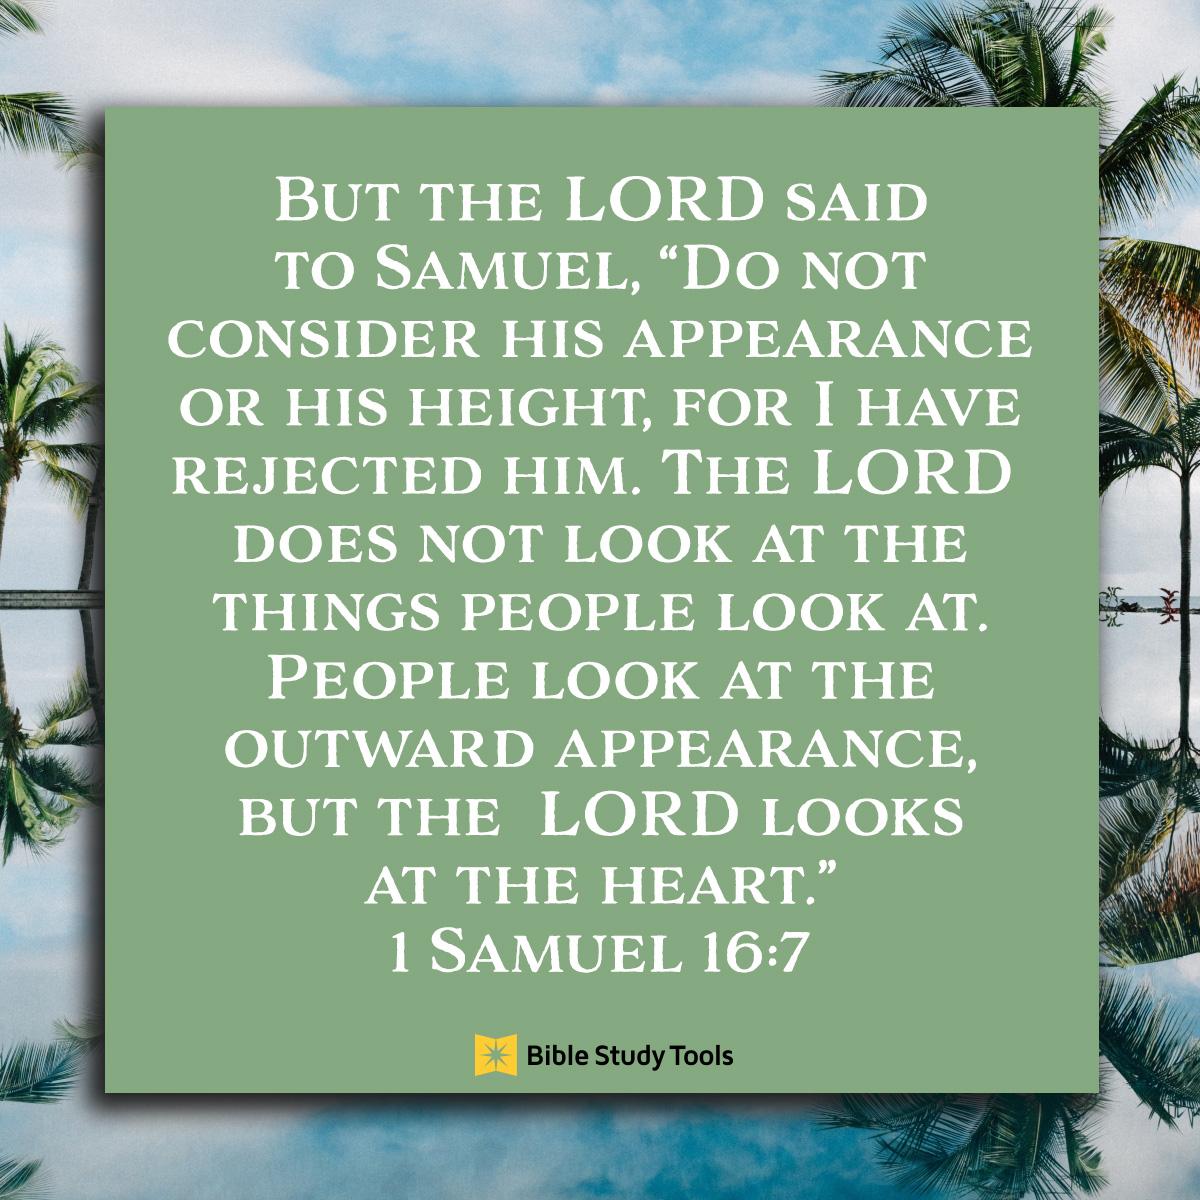 1 Samuel 16:7, inspirational image